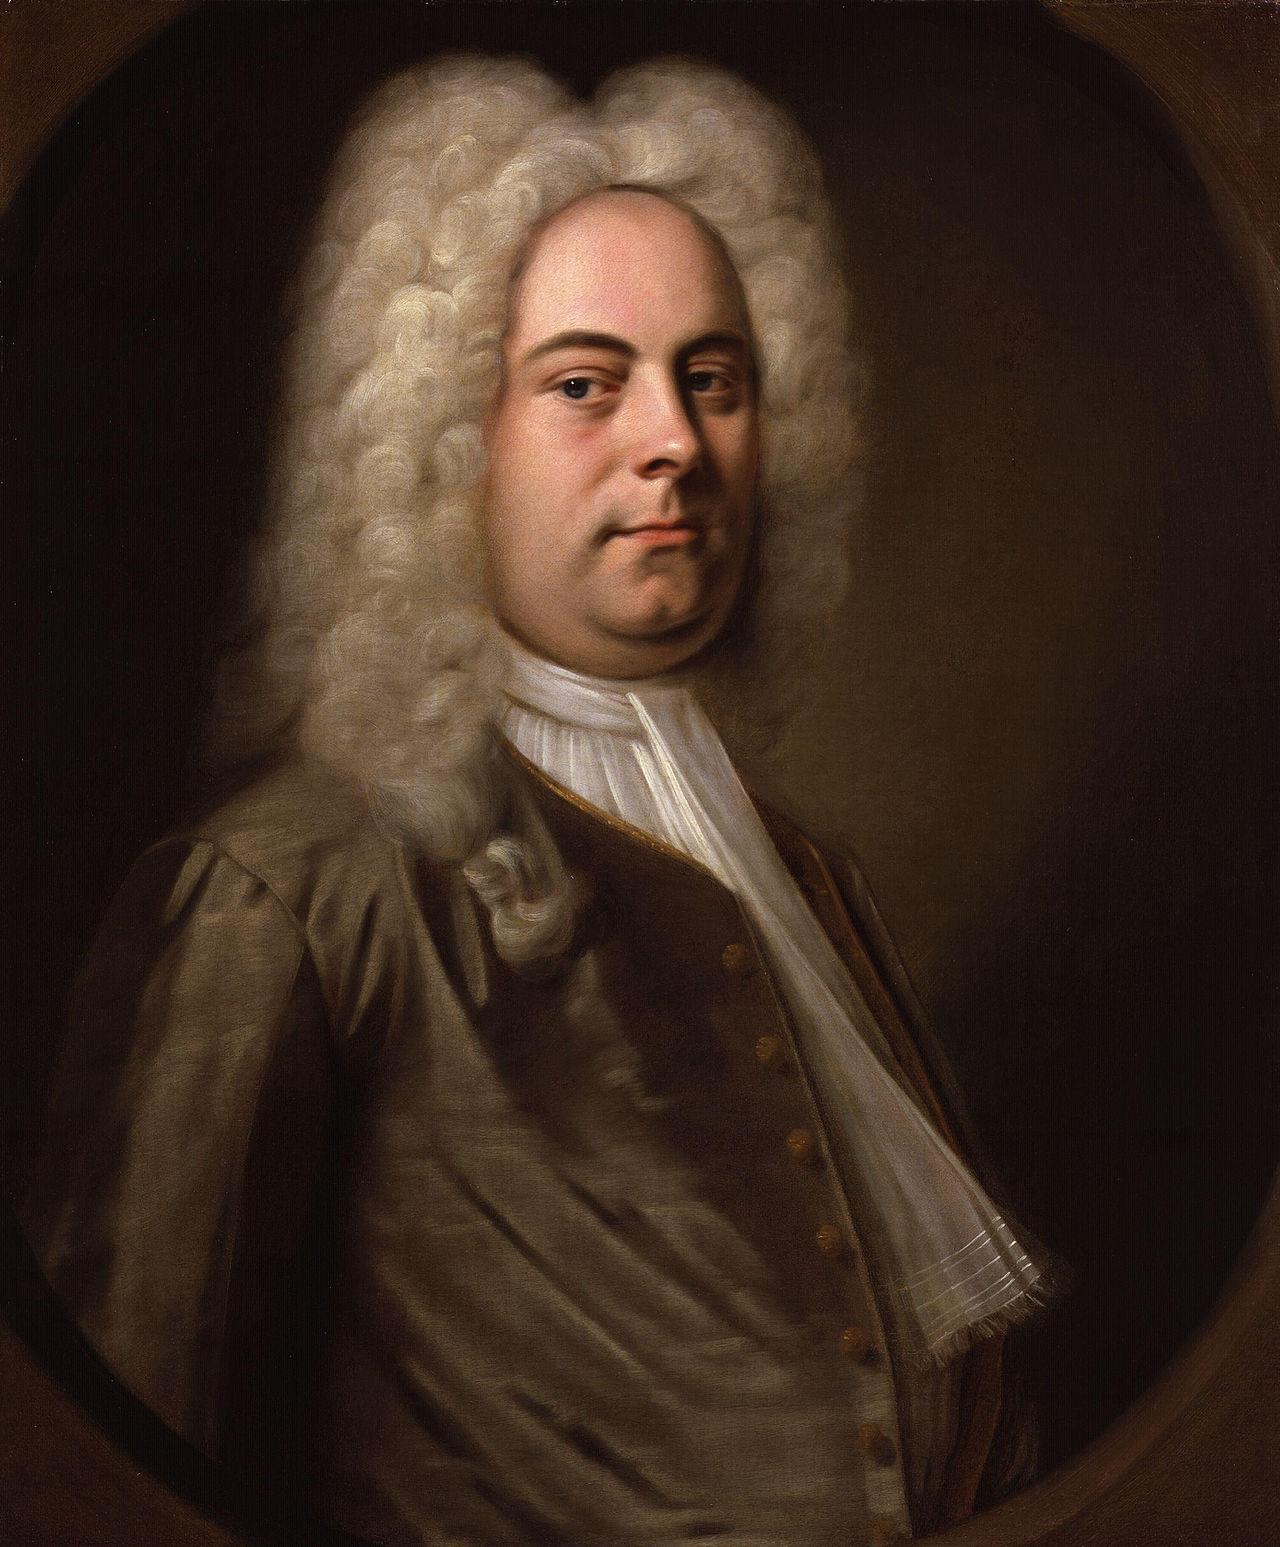 1280px-George_Frideric_Handel_by_Balthasar_Denner.jpg